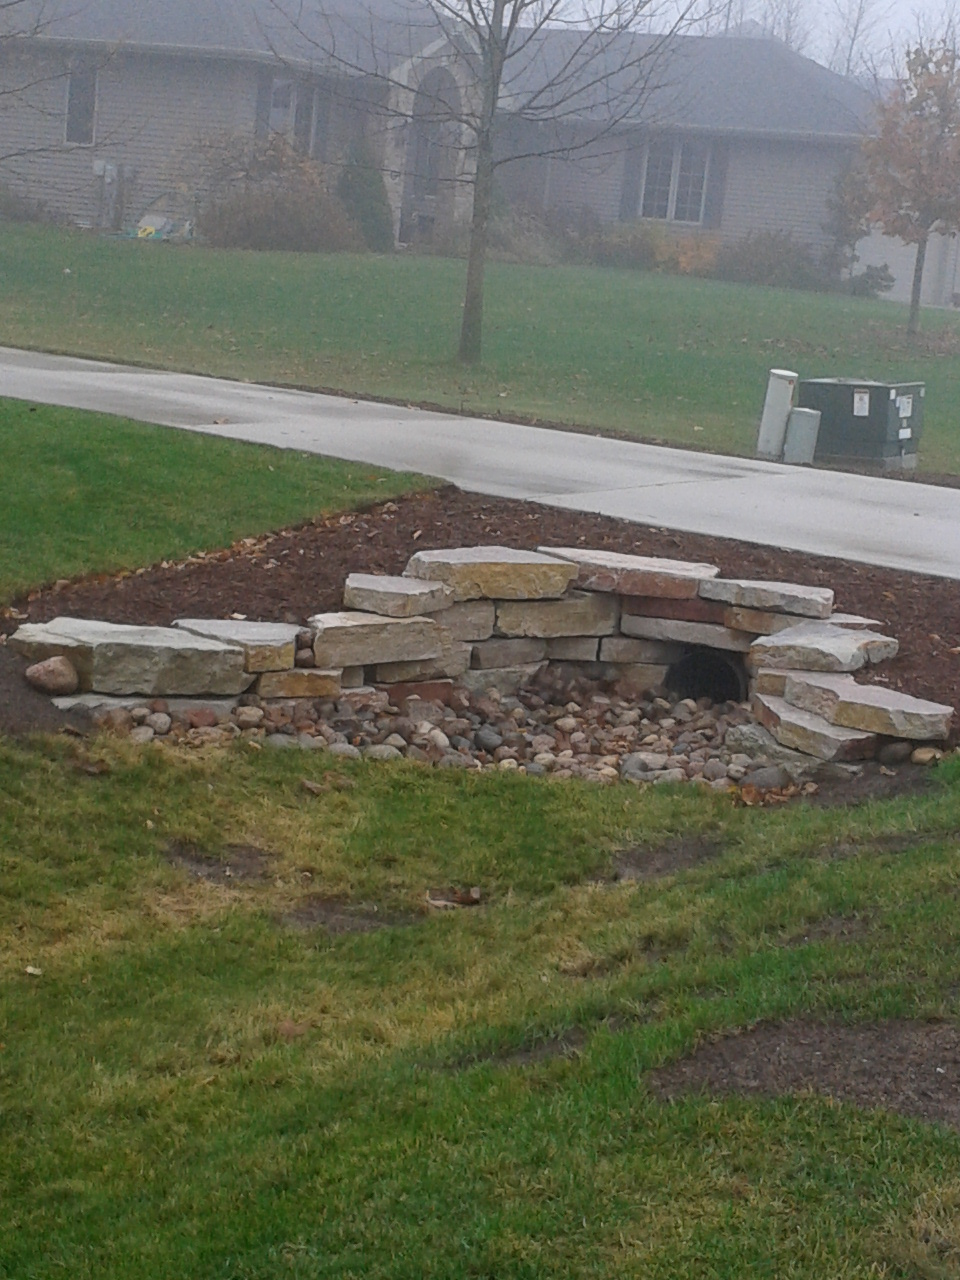 2012 10 23 09 41 04 Greenscape Lawn Amp Landscape